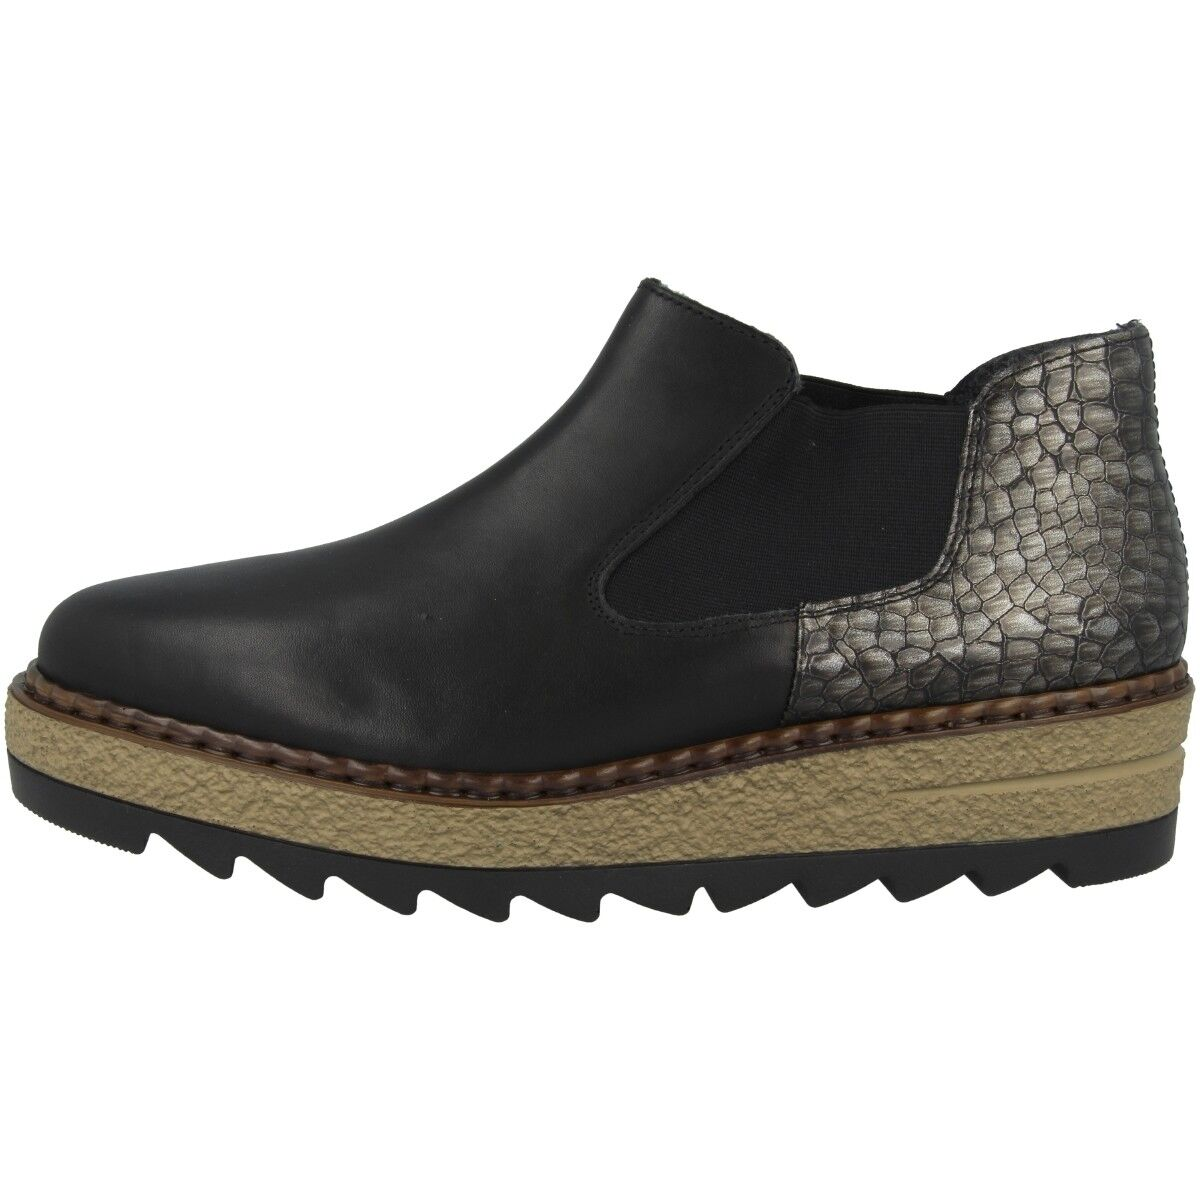 Rieker Antistress Clarino-Merida Schuhe Damen Antistress Rieker Slipper Chelsea Boots 55890-00 c59215